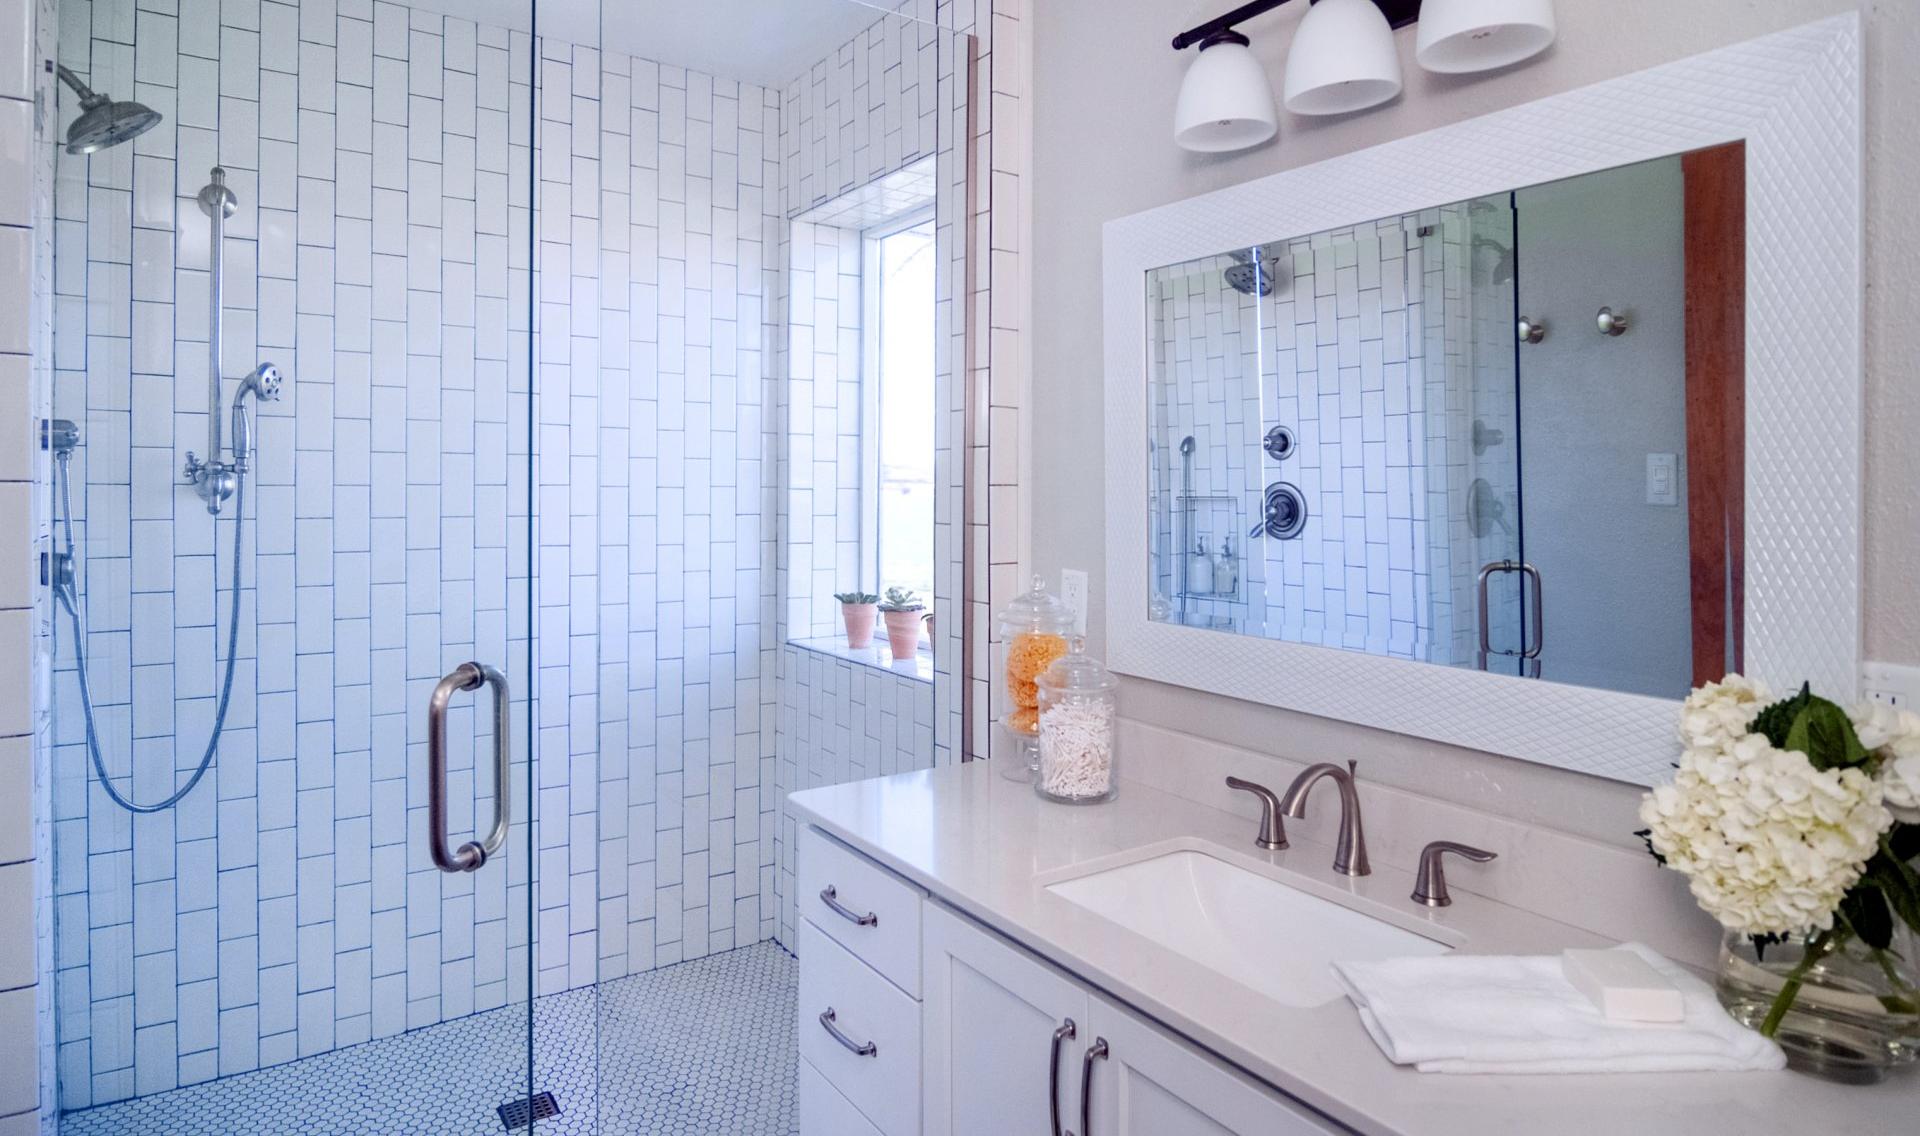 Bathroom Renovations Baton Rouge | Bathroom Remodel Baton ...